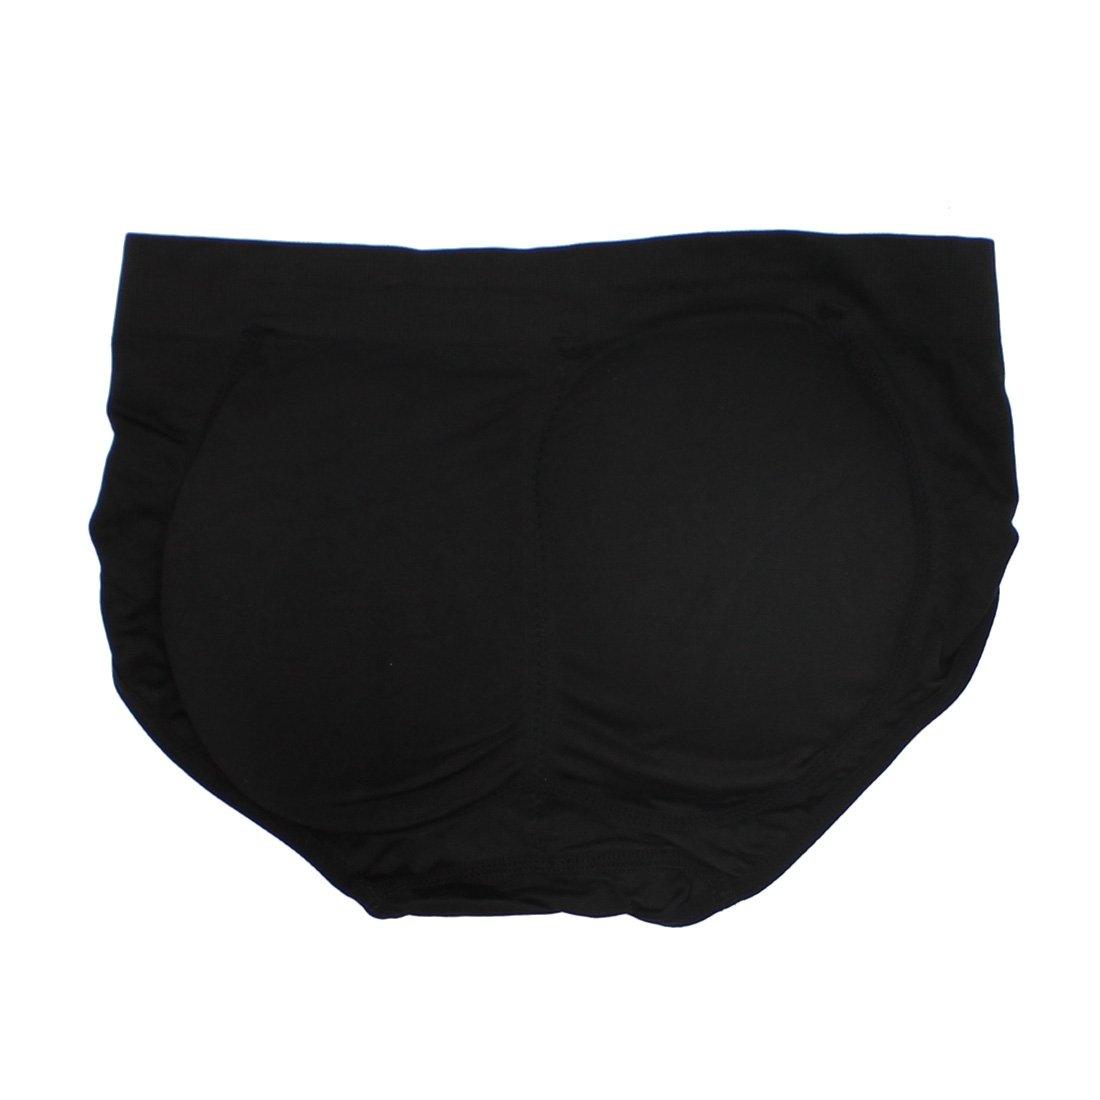 FEMINA 6 Pairs Butt-Lifting Panties